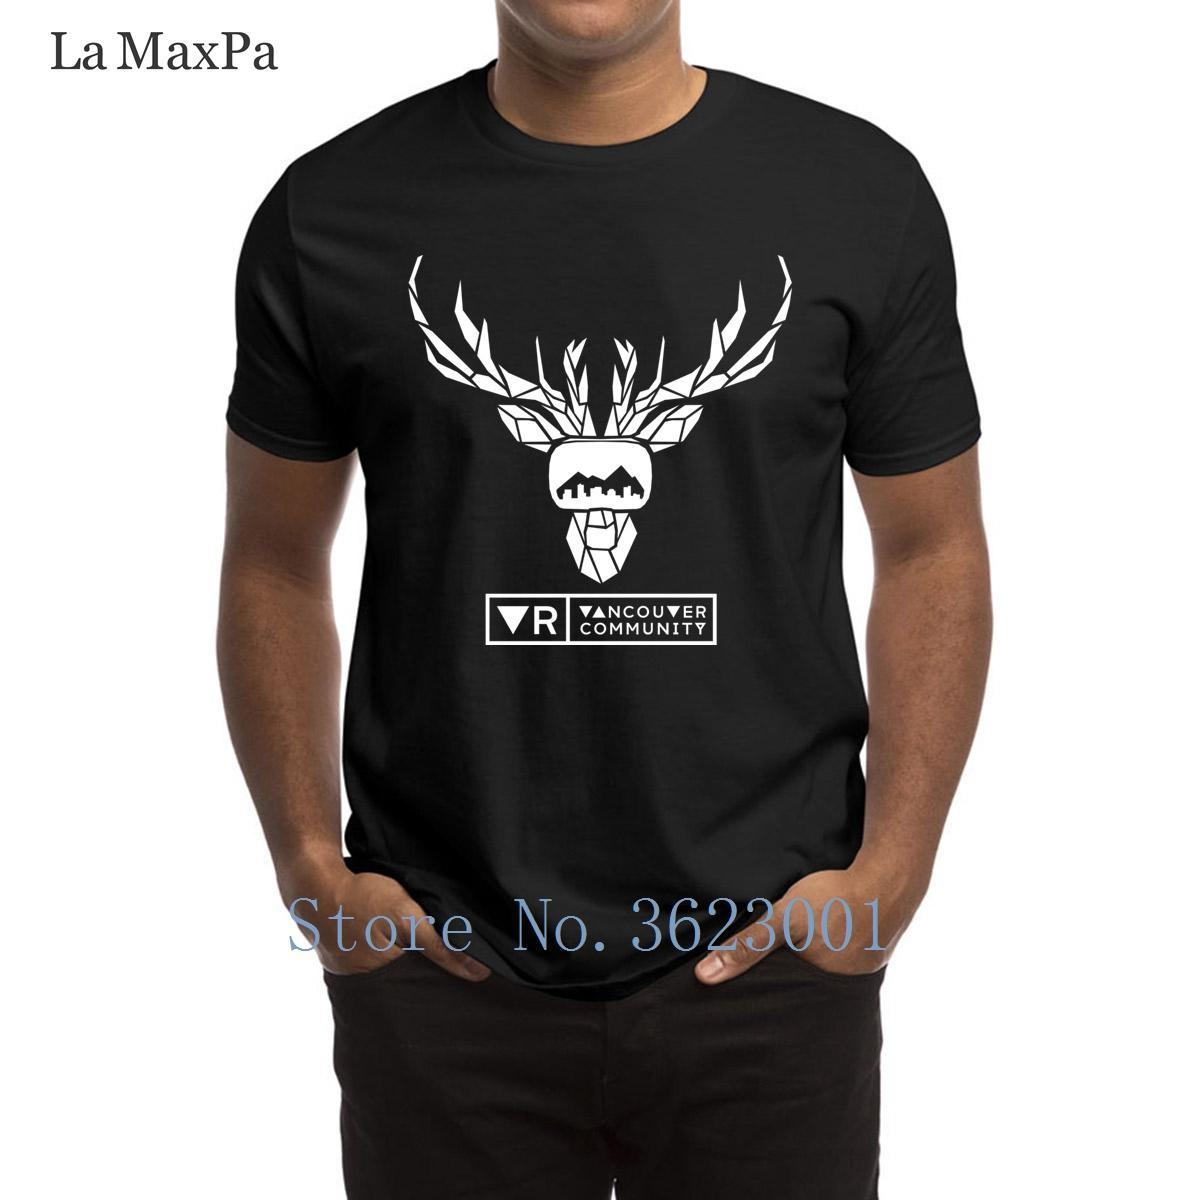 6d1f1b62 Custom Novelty T Shirt Man Vancouver Vr Community T Shirt Funky Summer  Style Men Tshirt Better O Neck Tee Shirt Pop Top Tee T Shirts Sale Novelty  Shirts ...